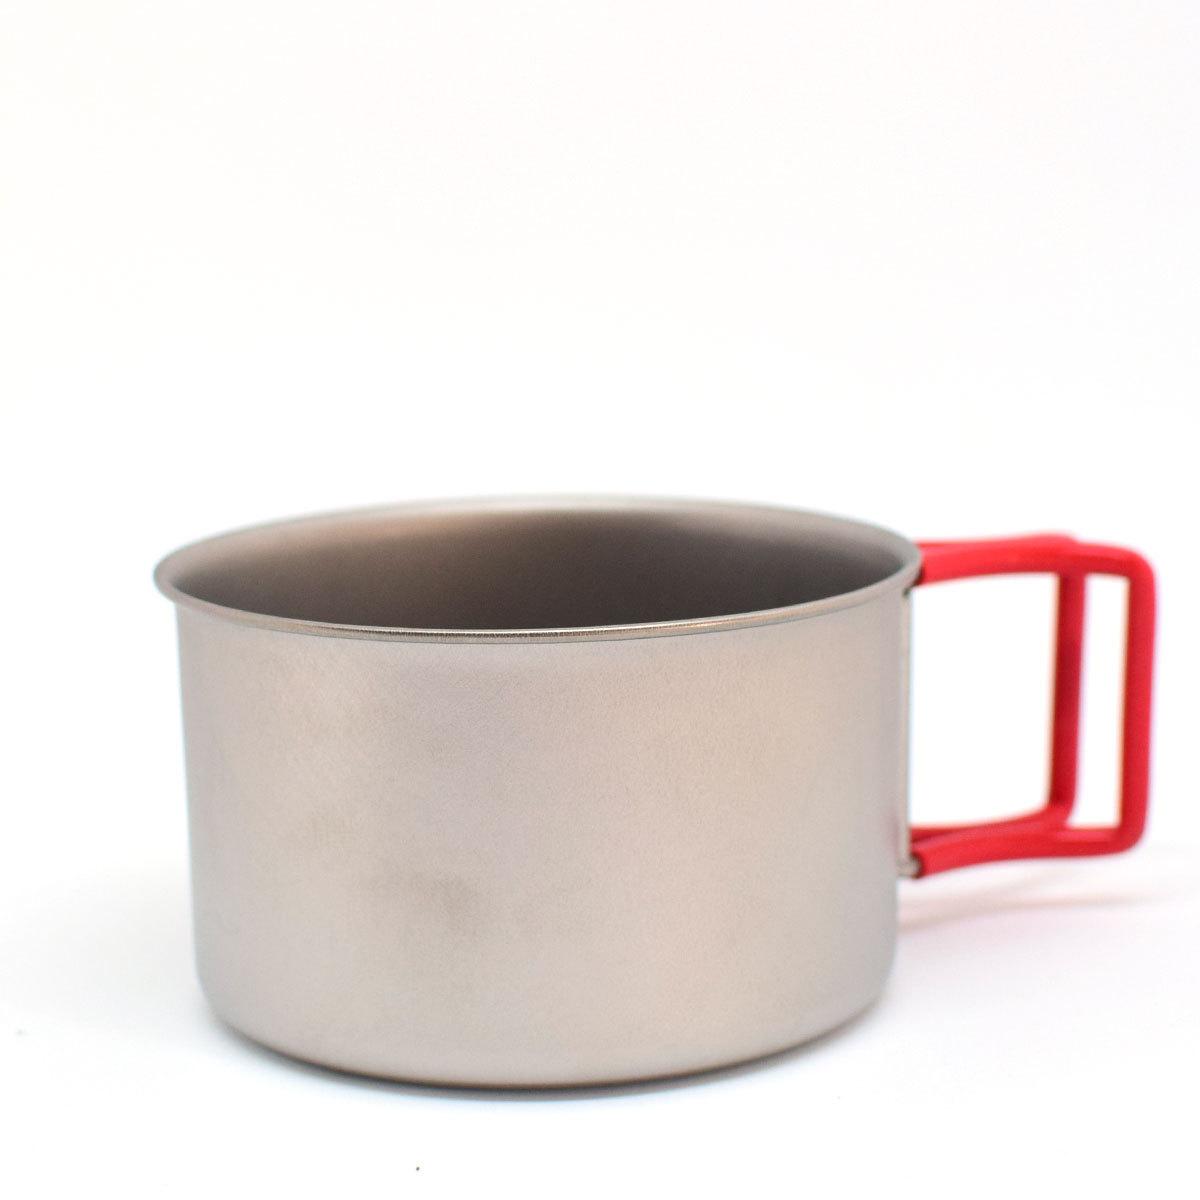 EVERNEW チタンカップ400FD RED EBY265R エバニュー